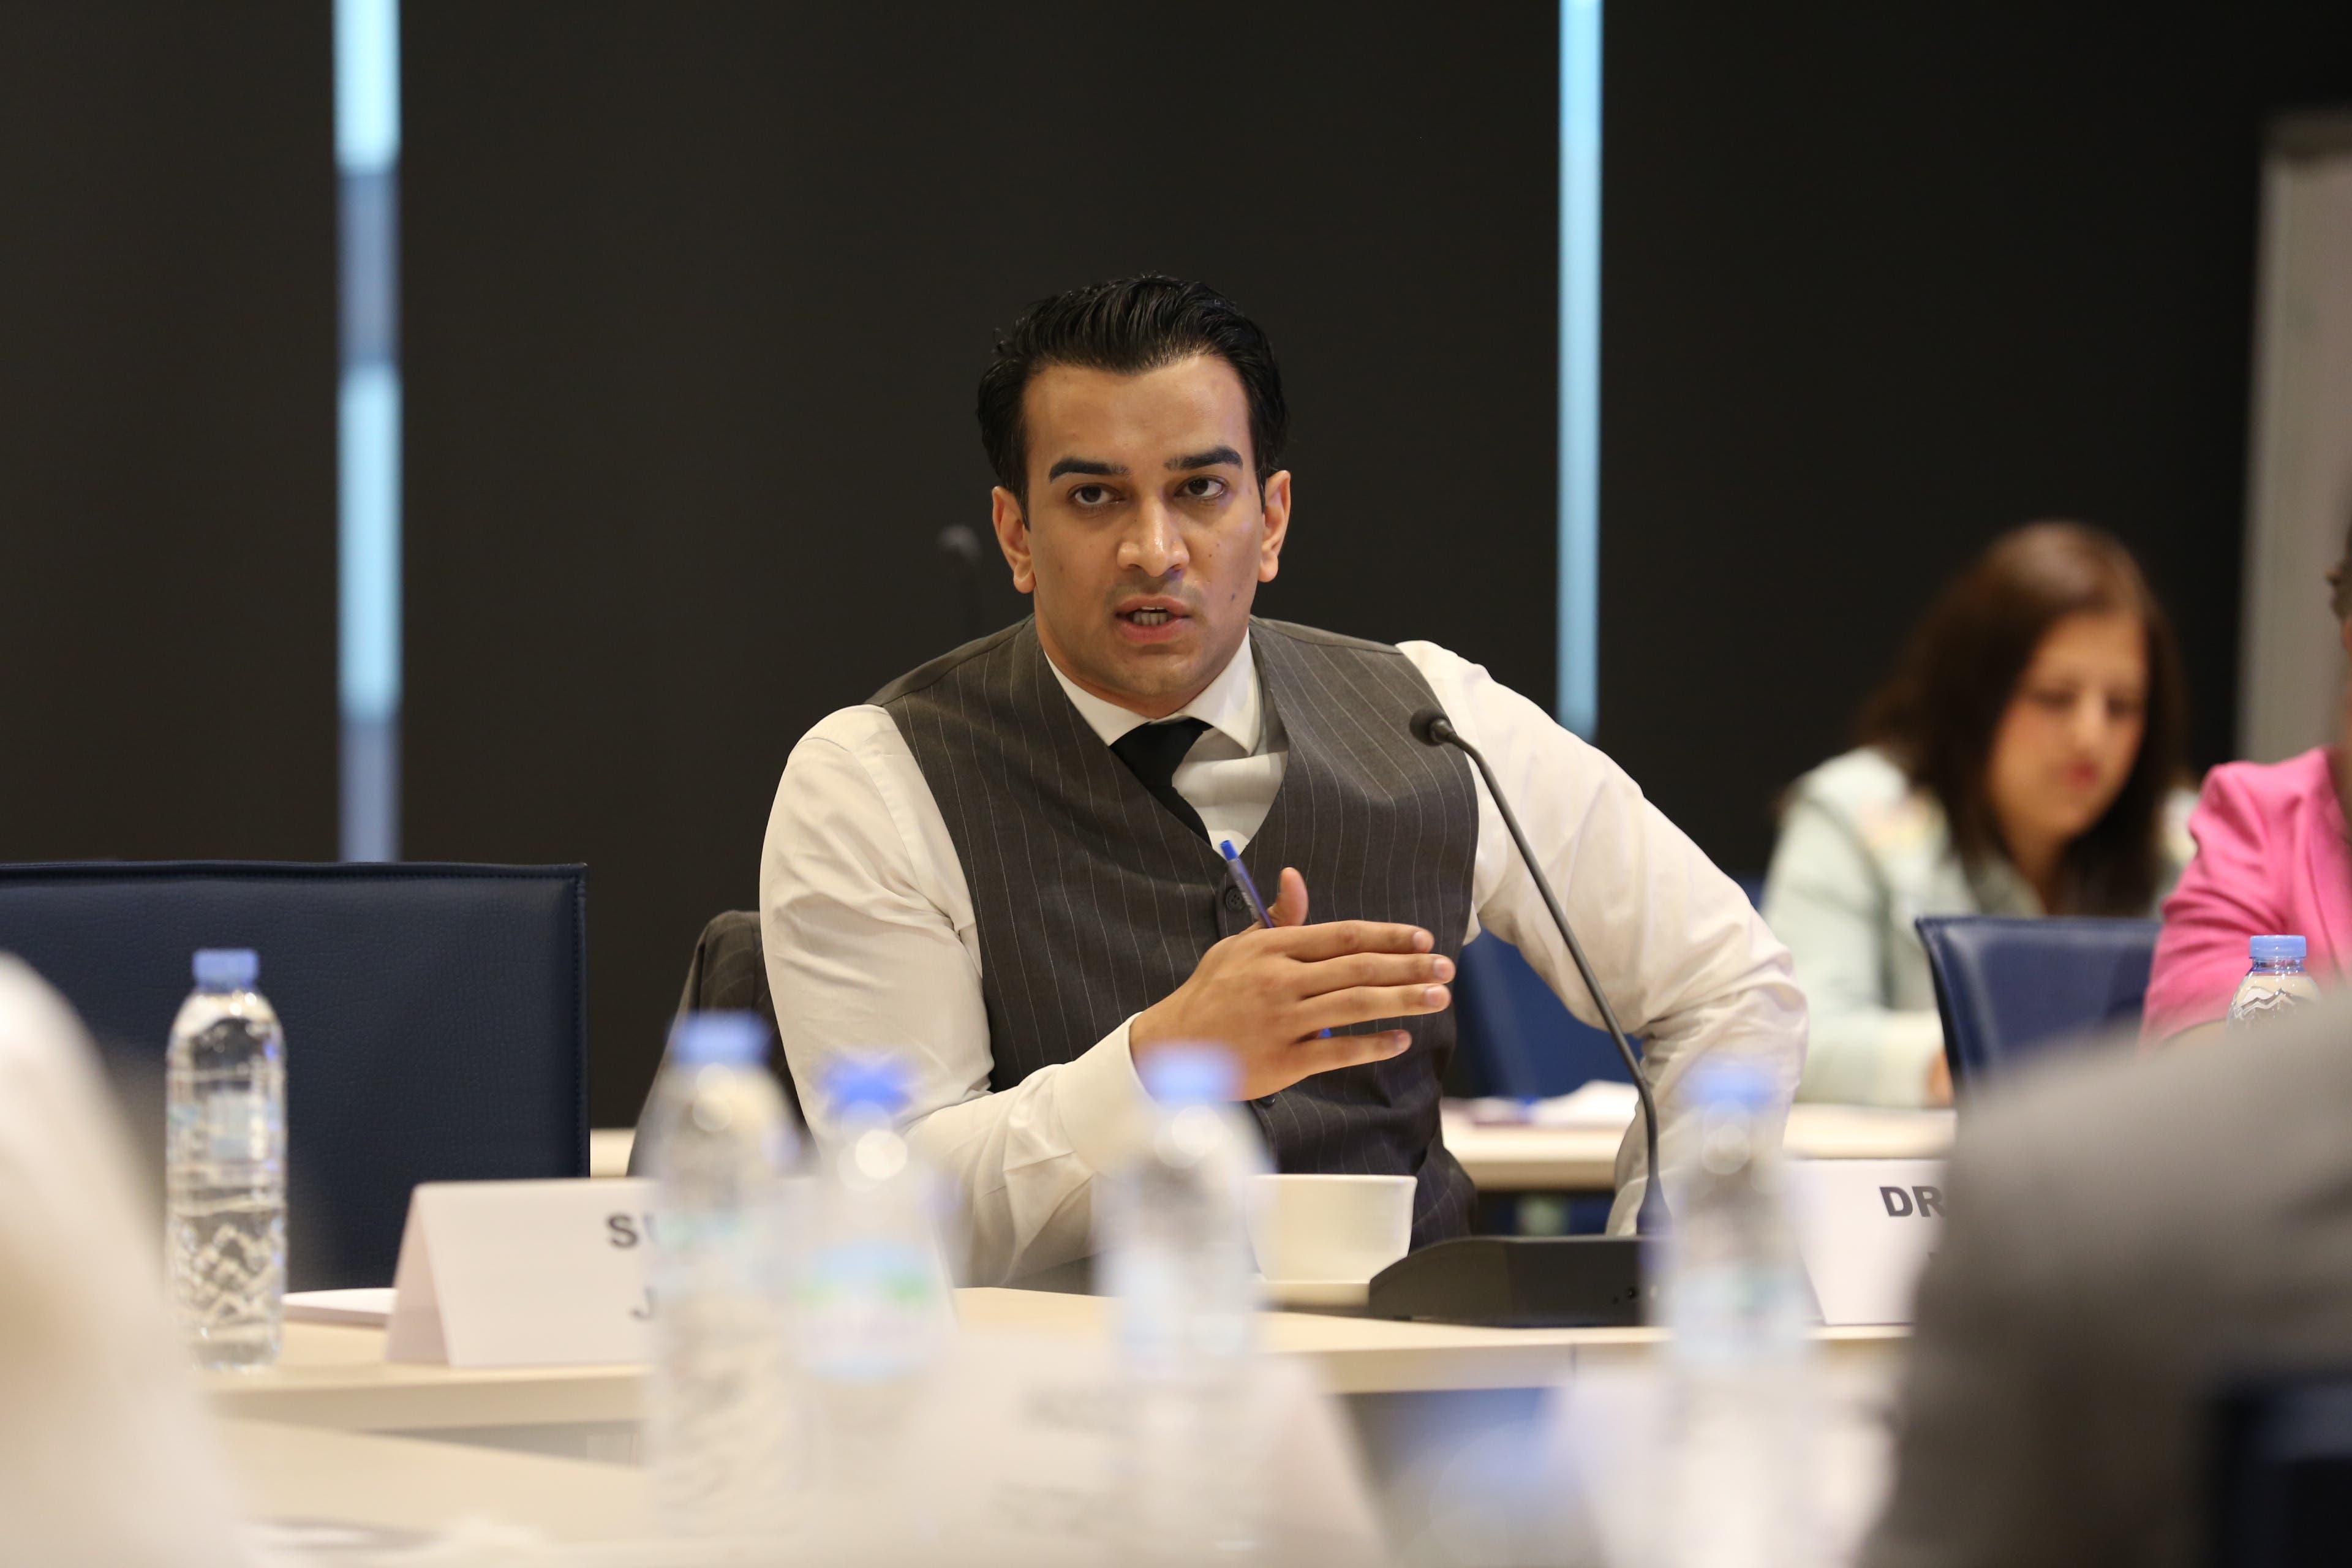 Azeem Ibrahim, a fellow at the University of Oxford's Mansfield College. (Al Arabiya News)